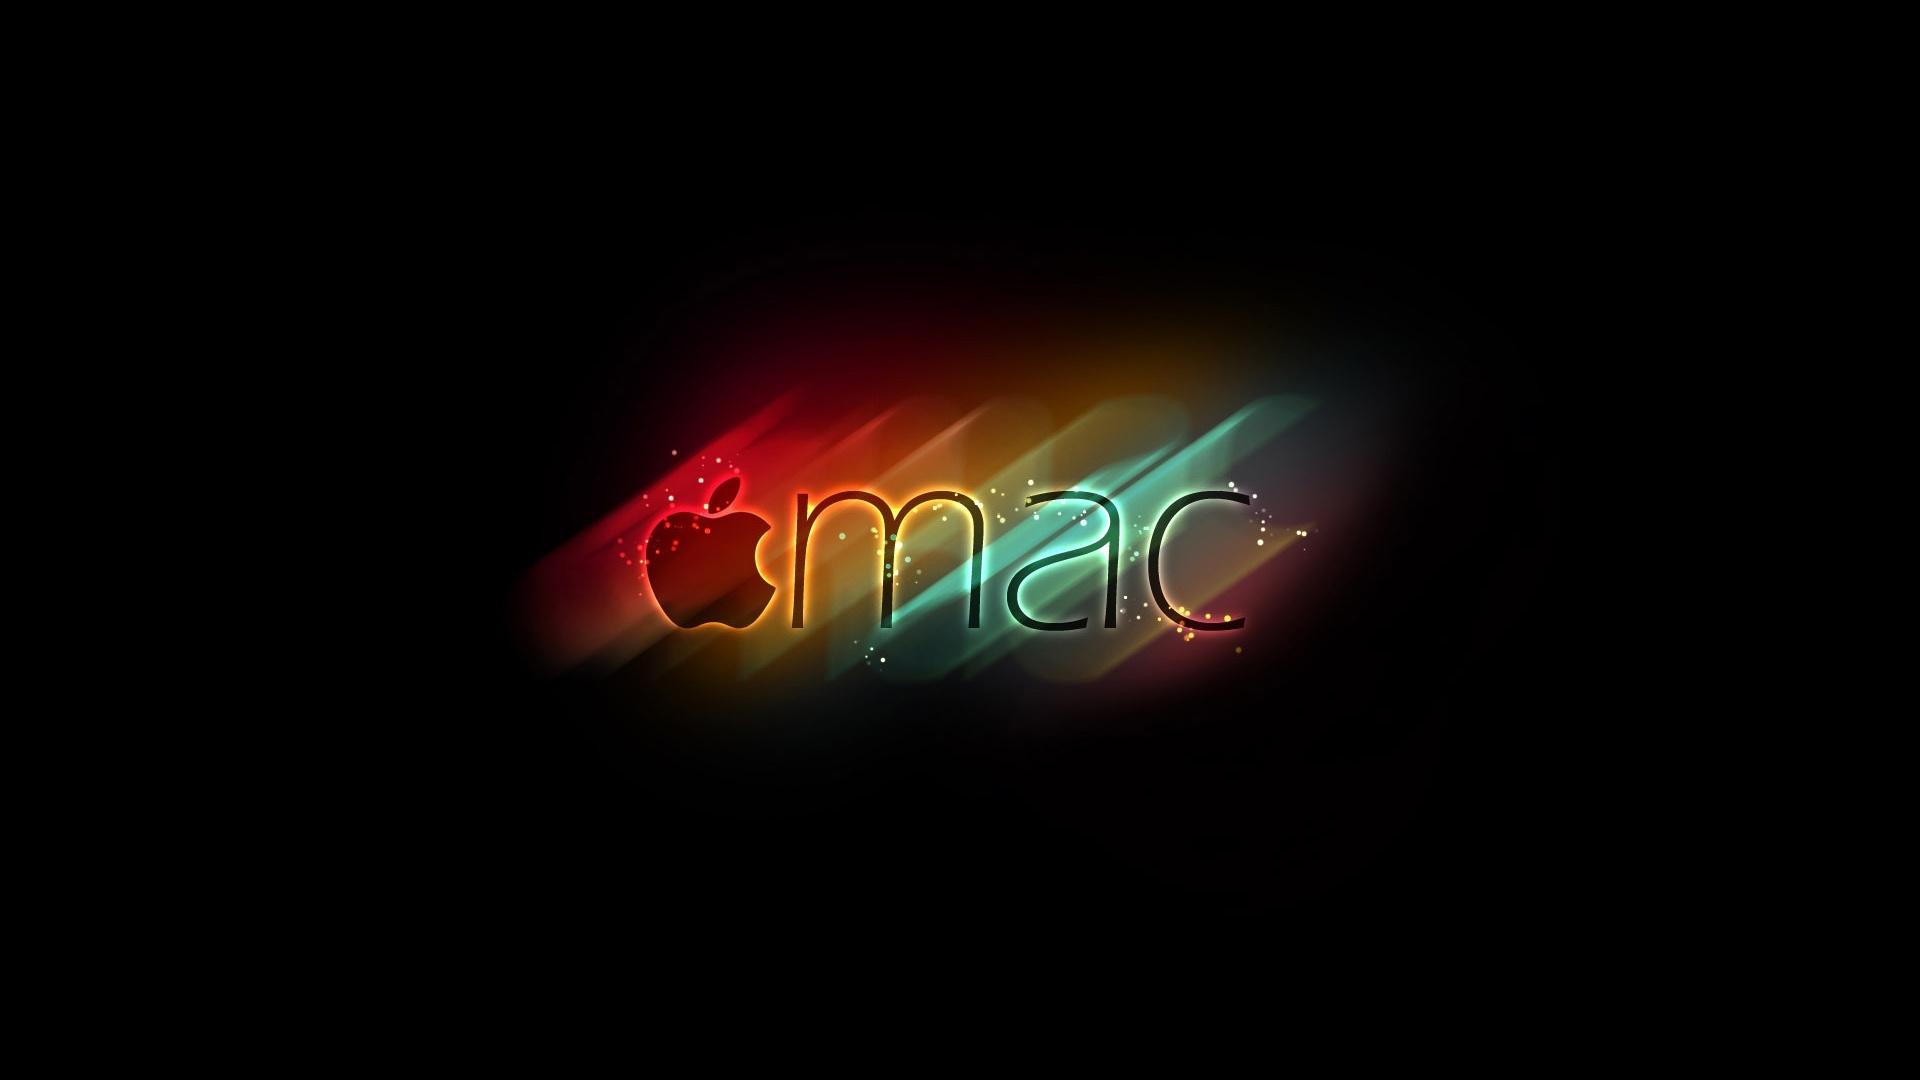 Apple Mac Hd 11305 Hd Wallpaper